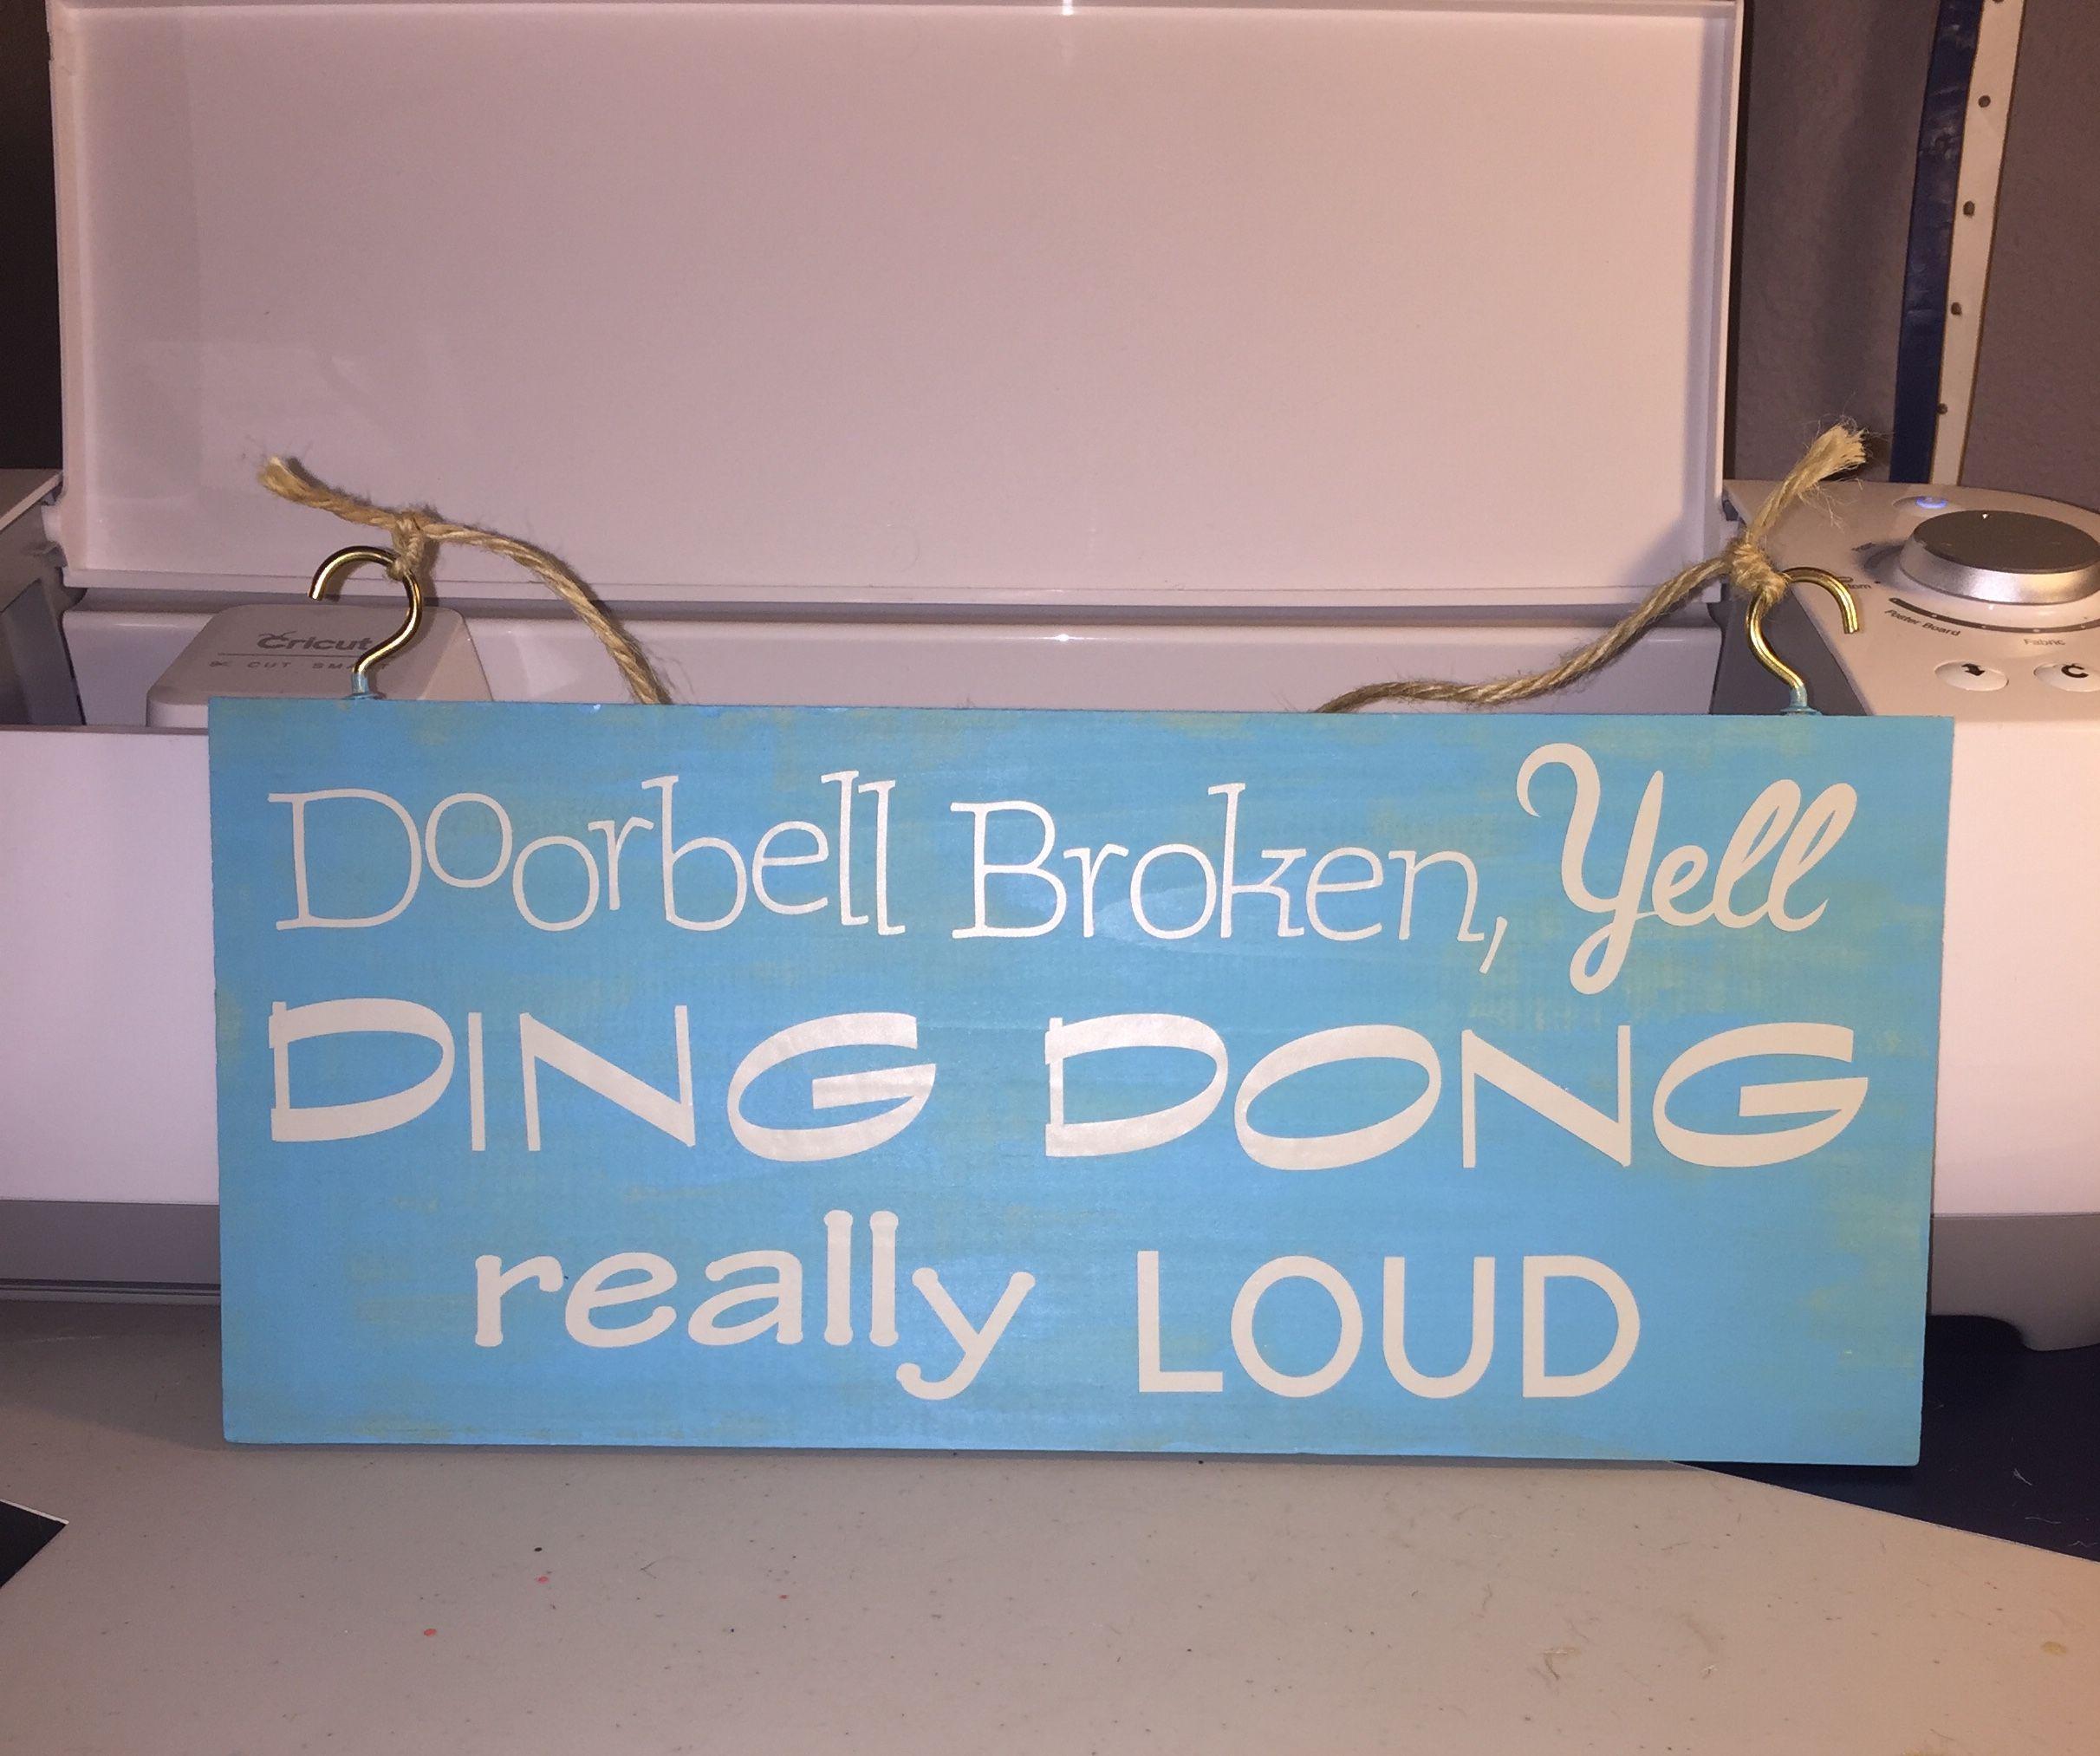 Doorbell Broken, Yell DING DONG really LOUD: DIY, Wooden sign, cricut, acrylic paint